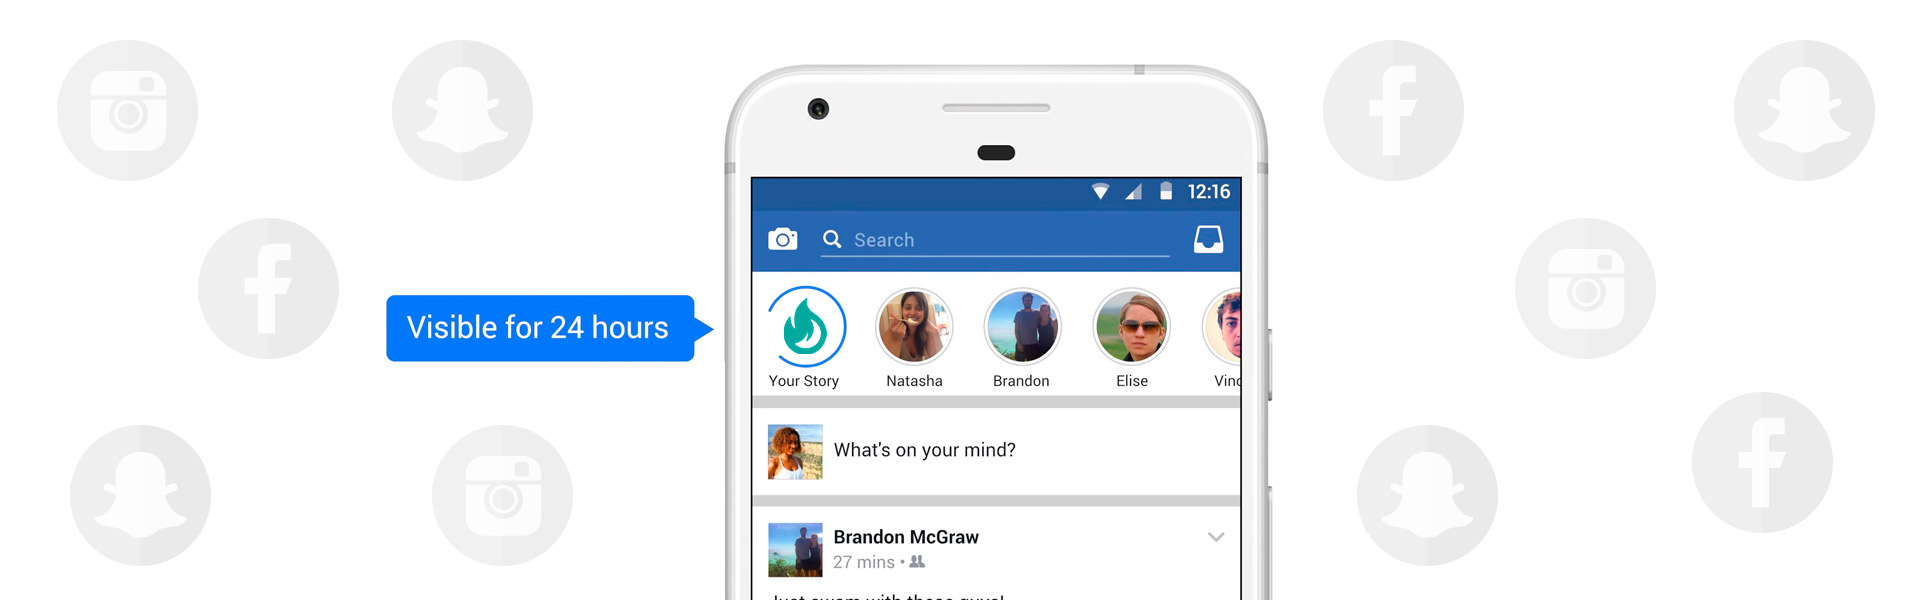 Llega Facebook Stories Para Matar Definitivamente A Snapchat